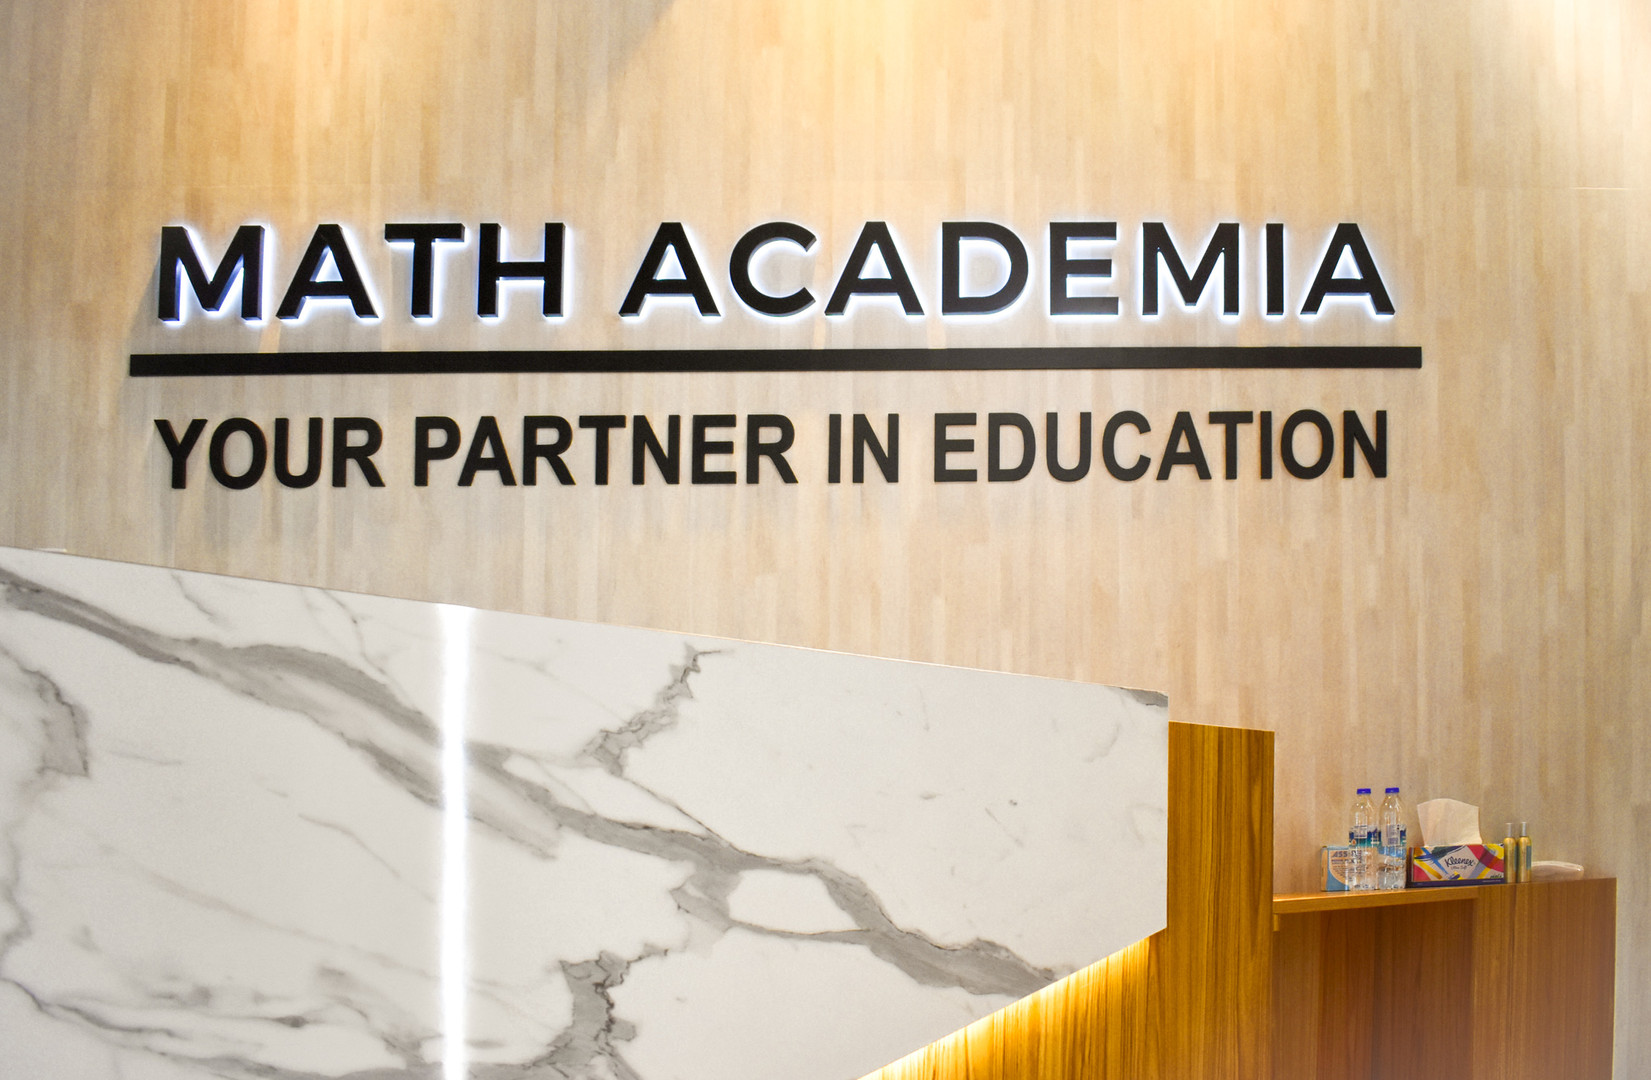 Math Academia Feature Wall